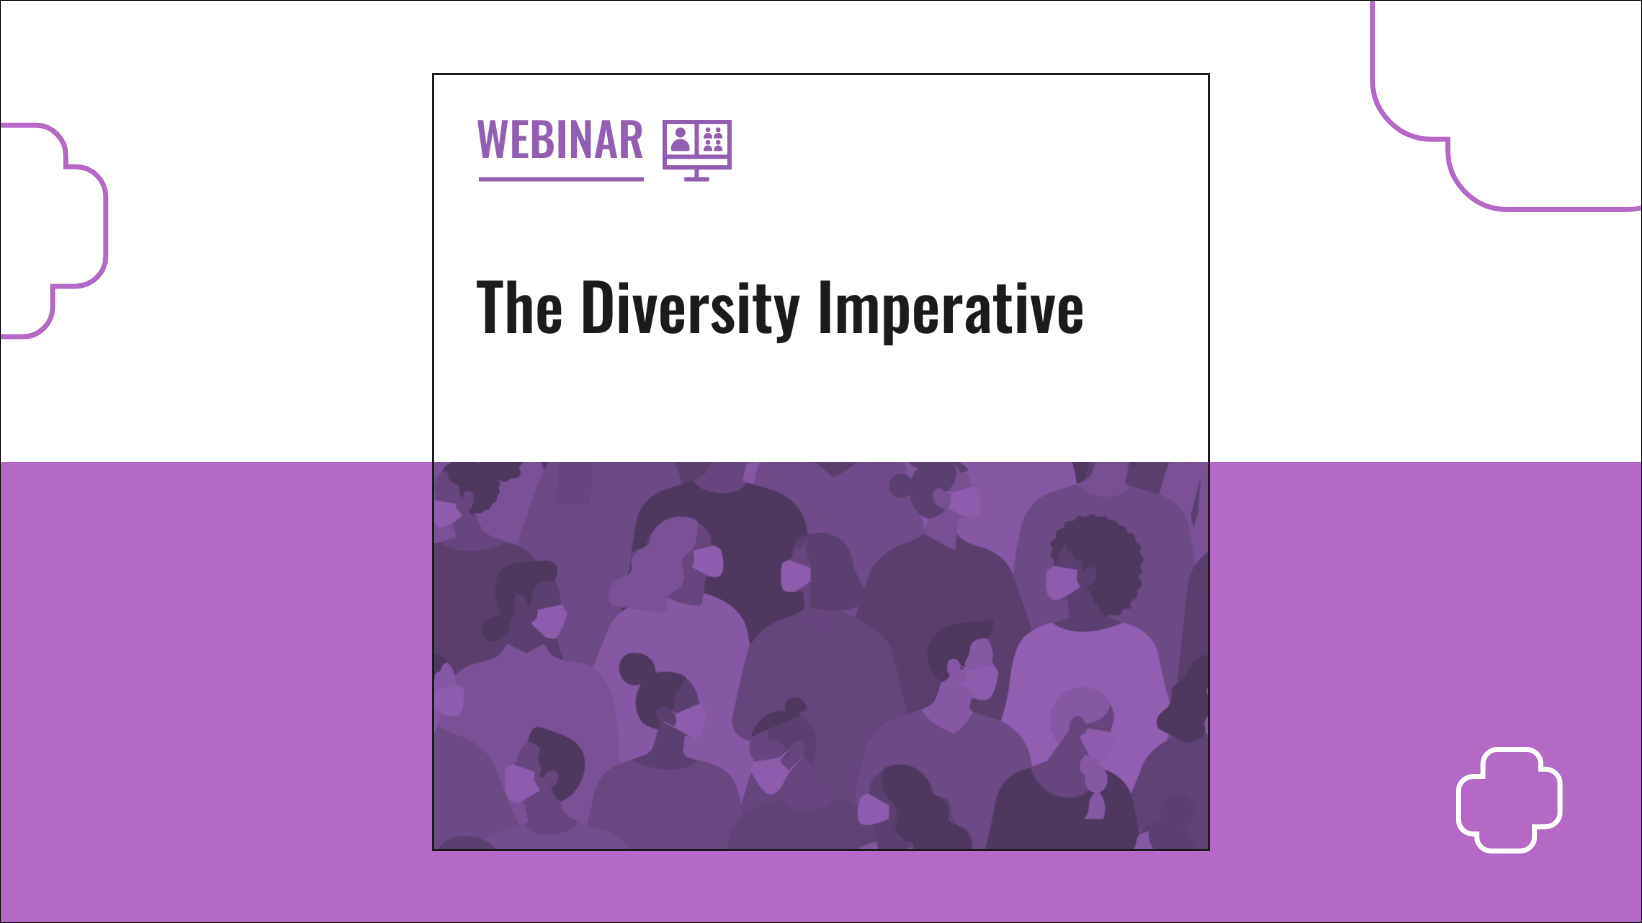 Webinar - The Diversity Imperative